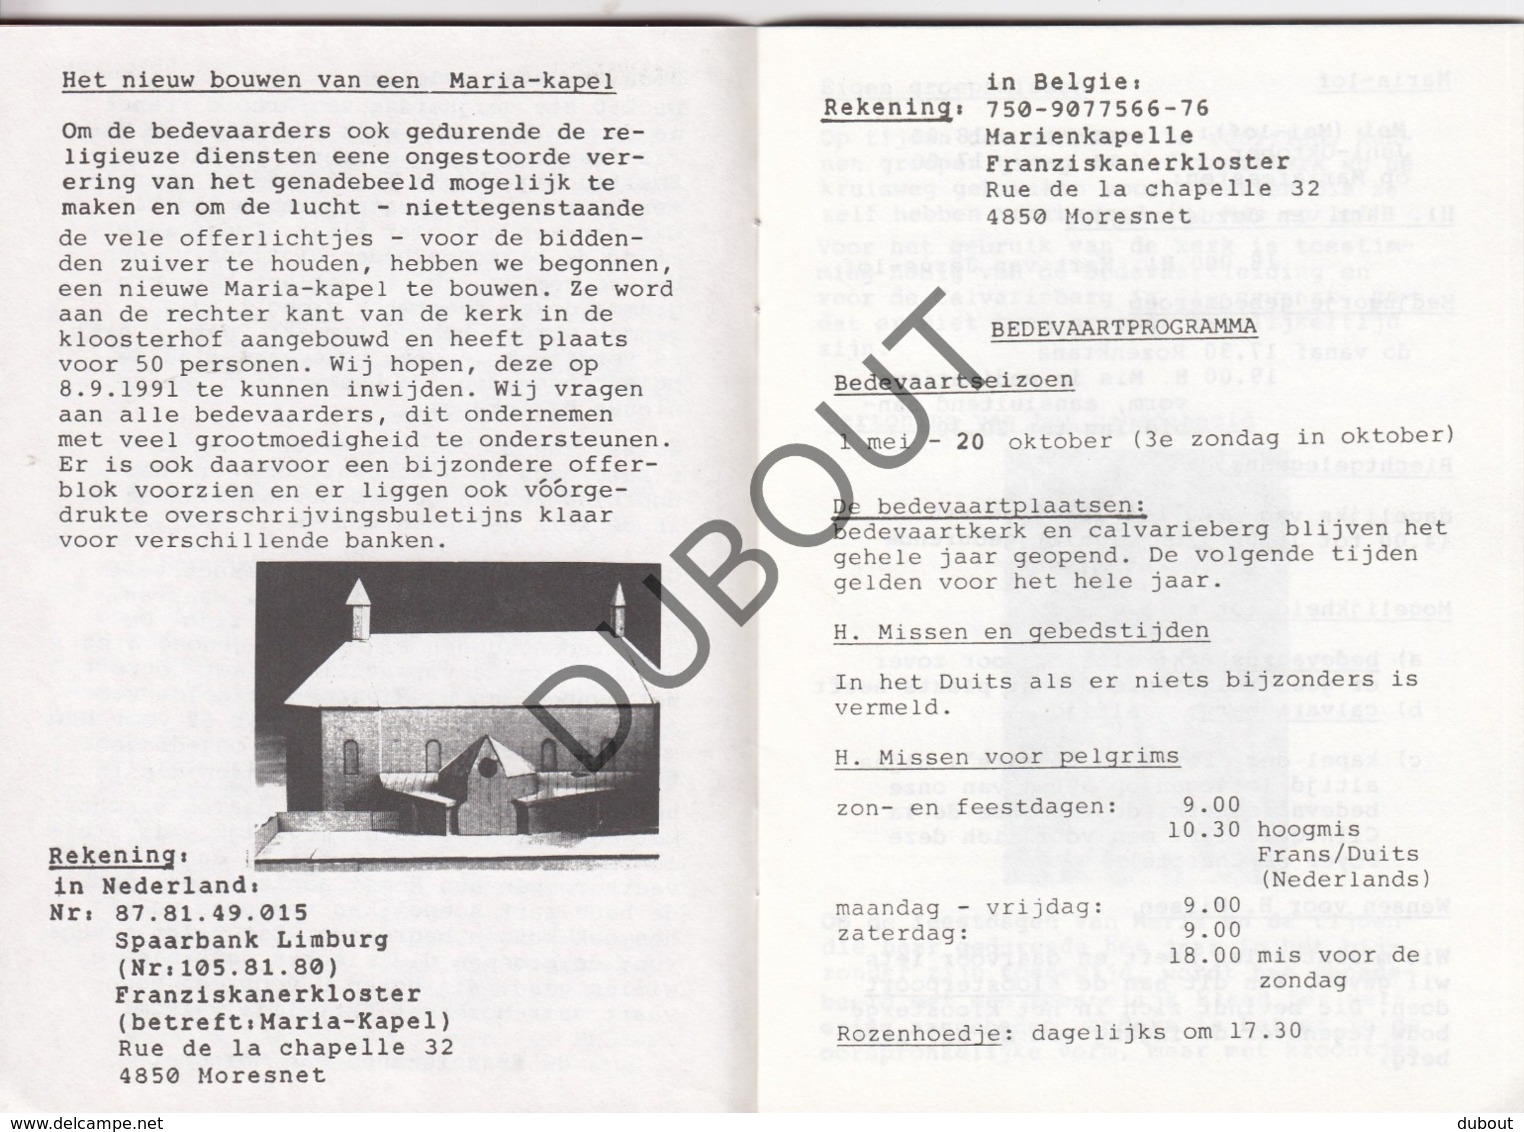 MORESNET/Blieberg/Luik 1991 Bedevaartprogramma Fransciscanen  (R278) - Oud